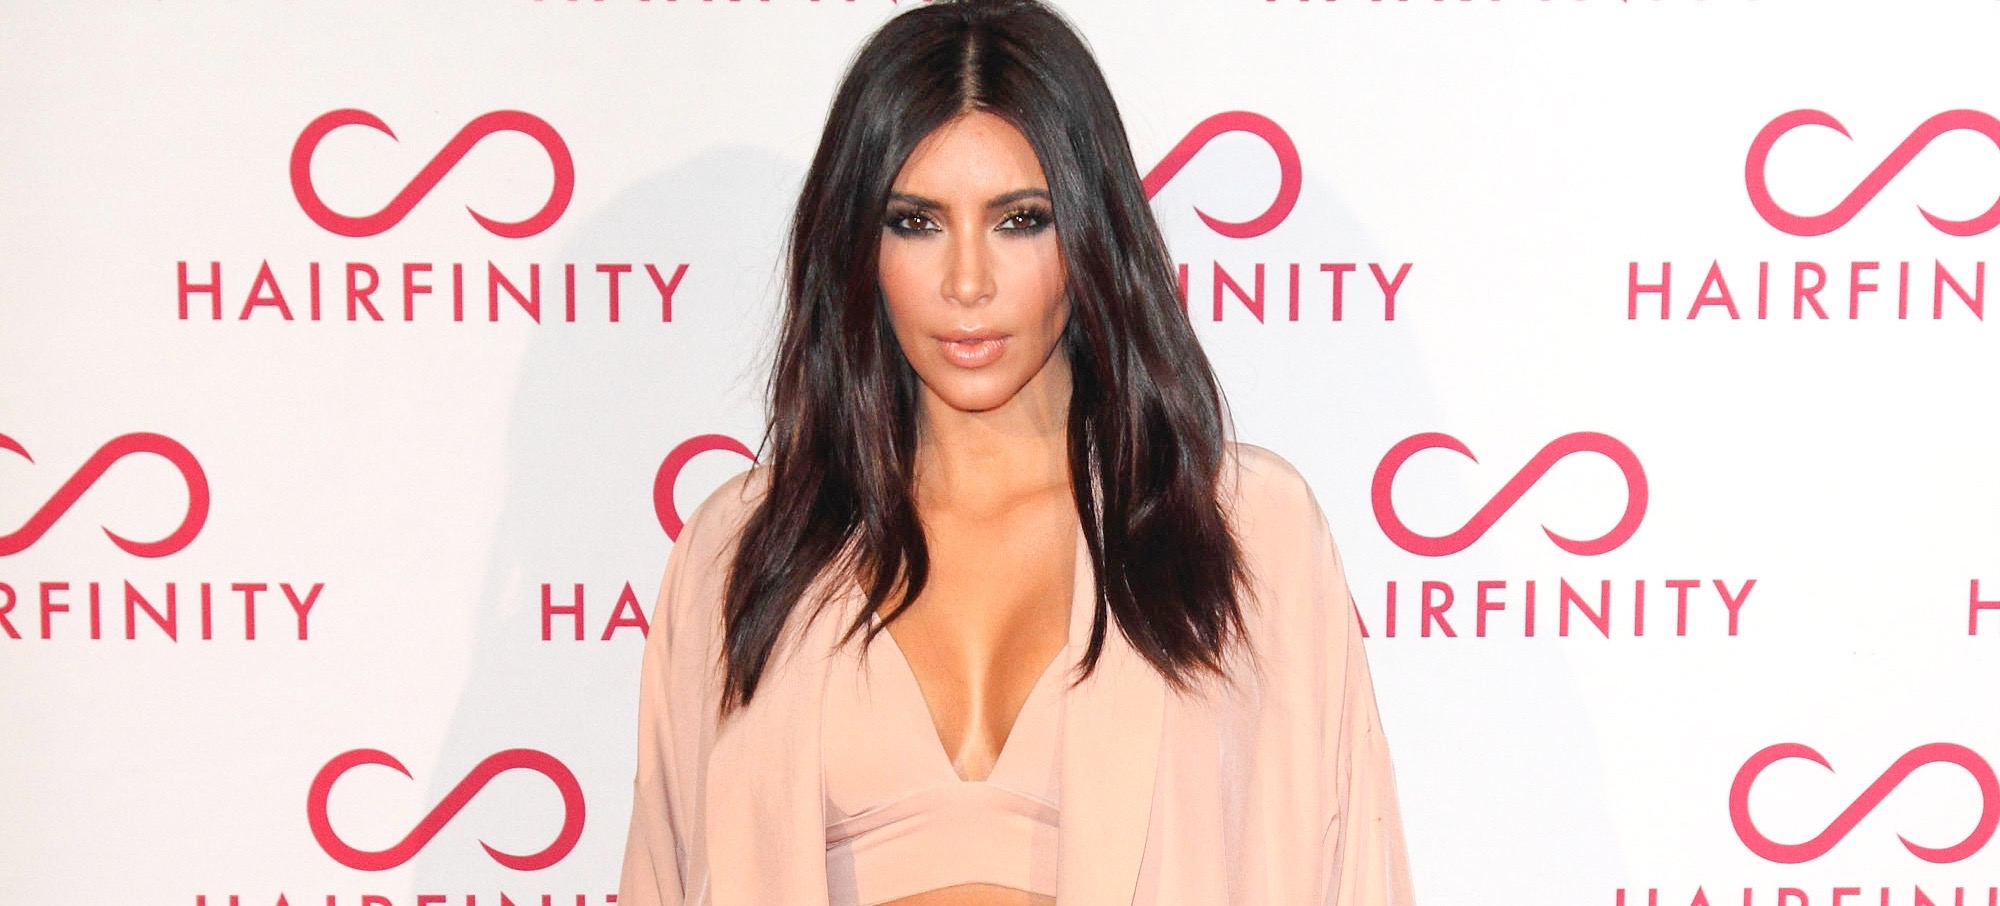 Video: How to Get Kim Kardashian's Signature Textured Waves